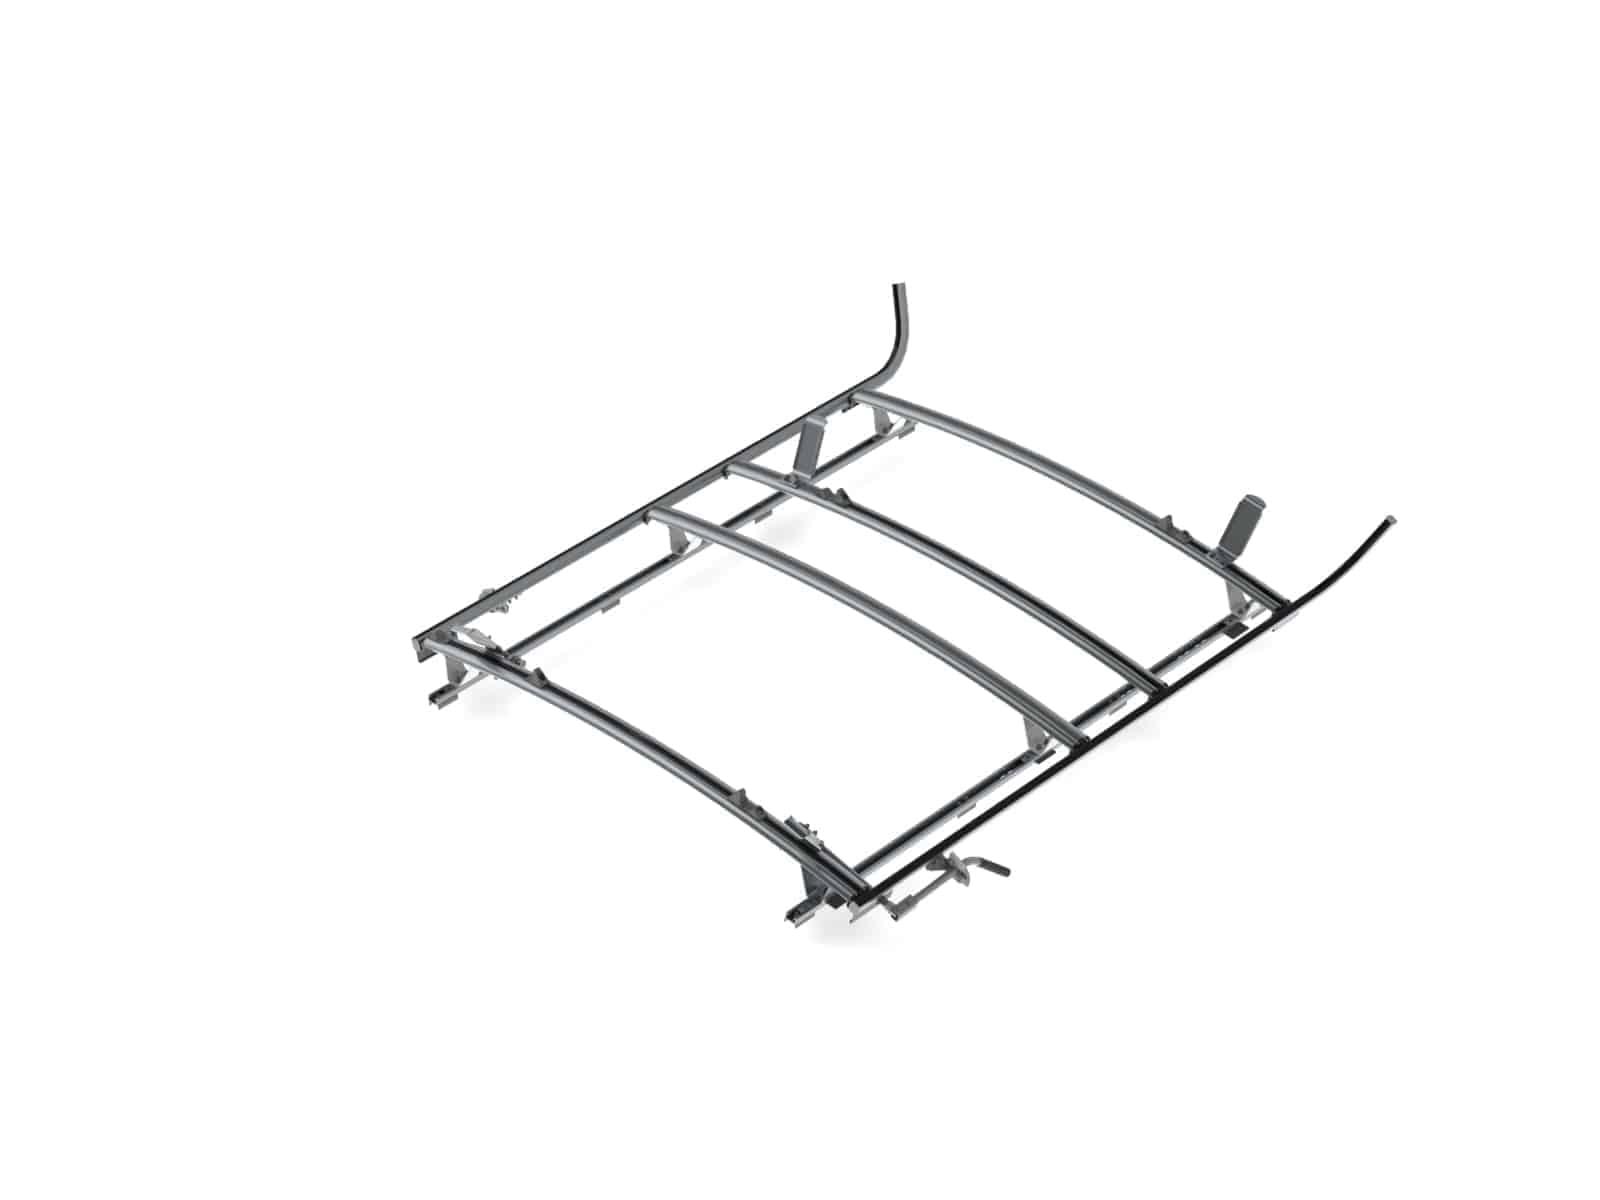 Combination Ram Promaster Ladder Rack 3 Bar System